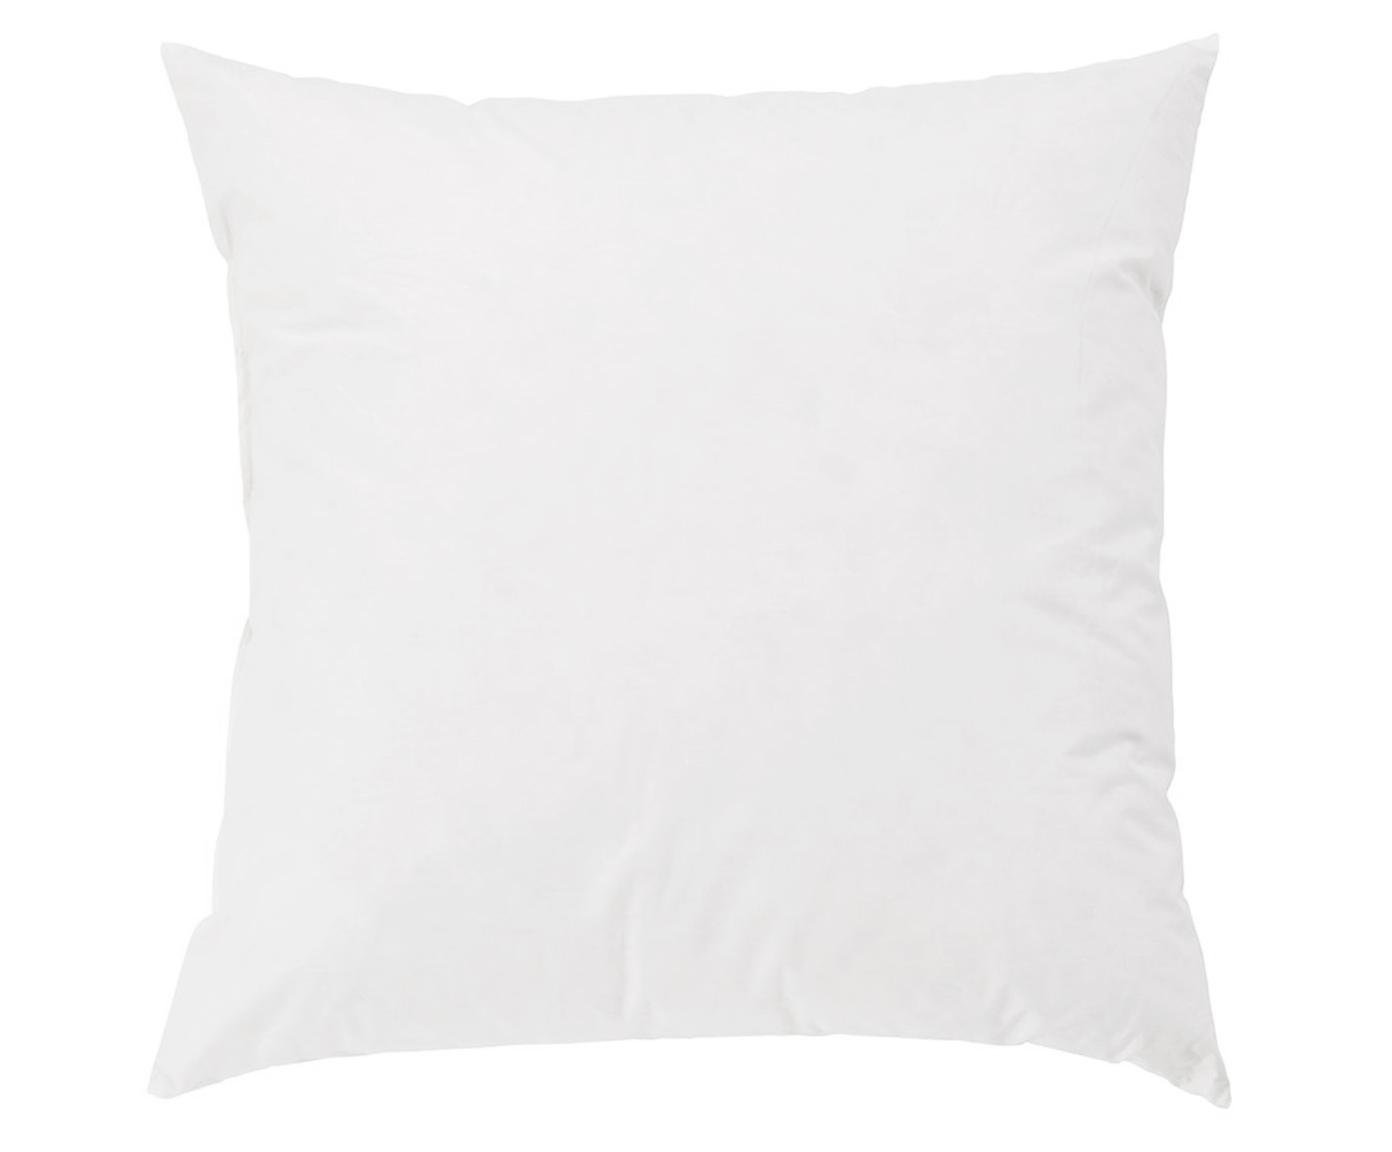 Relleno de cojín Komfort, 40x40, Funda: percal Mako, 100%algodón, Blanco, An 40 x L 40 cm